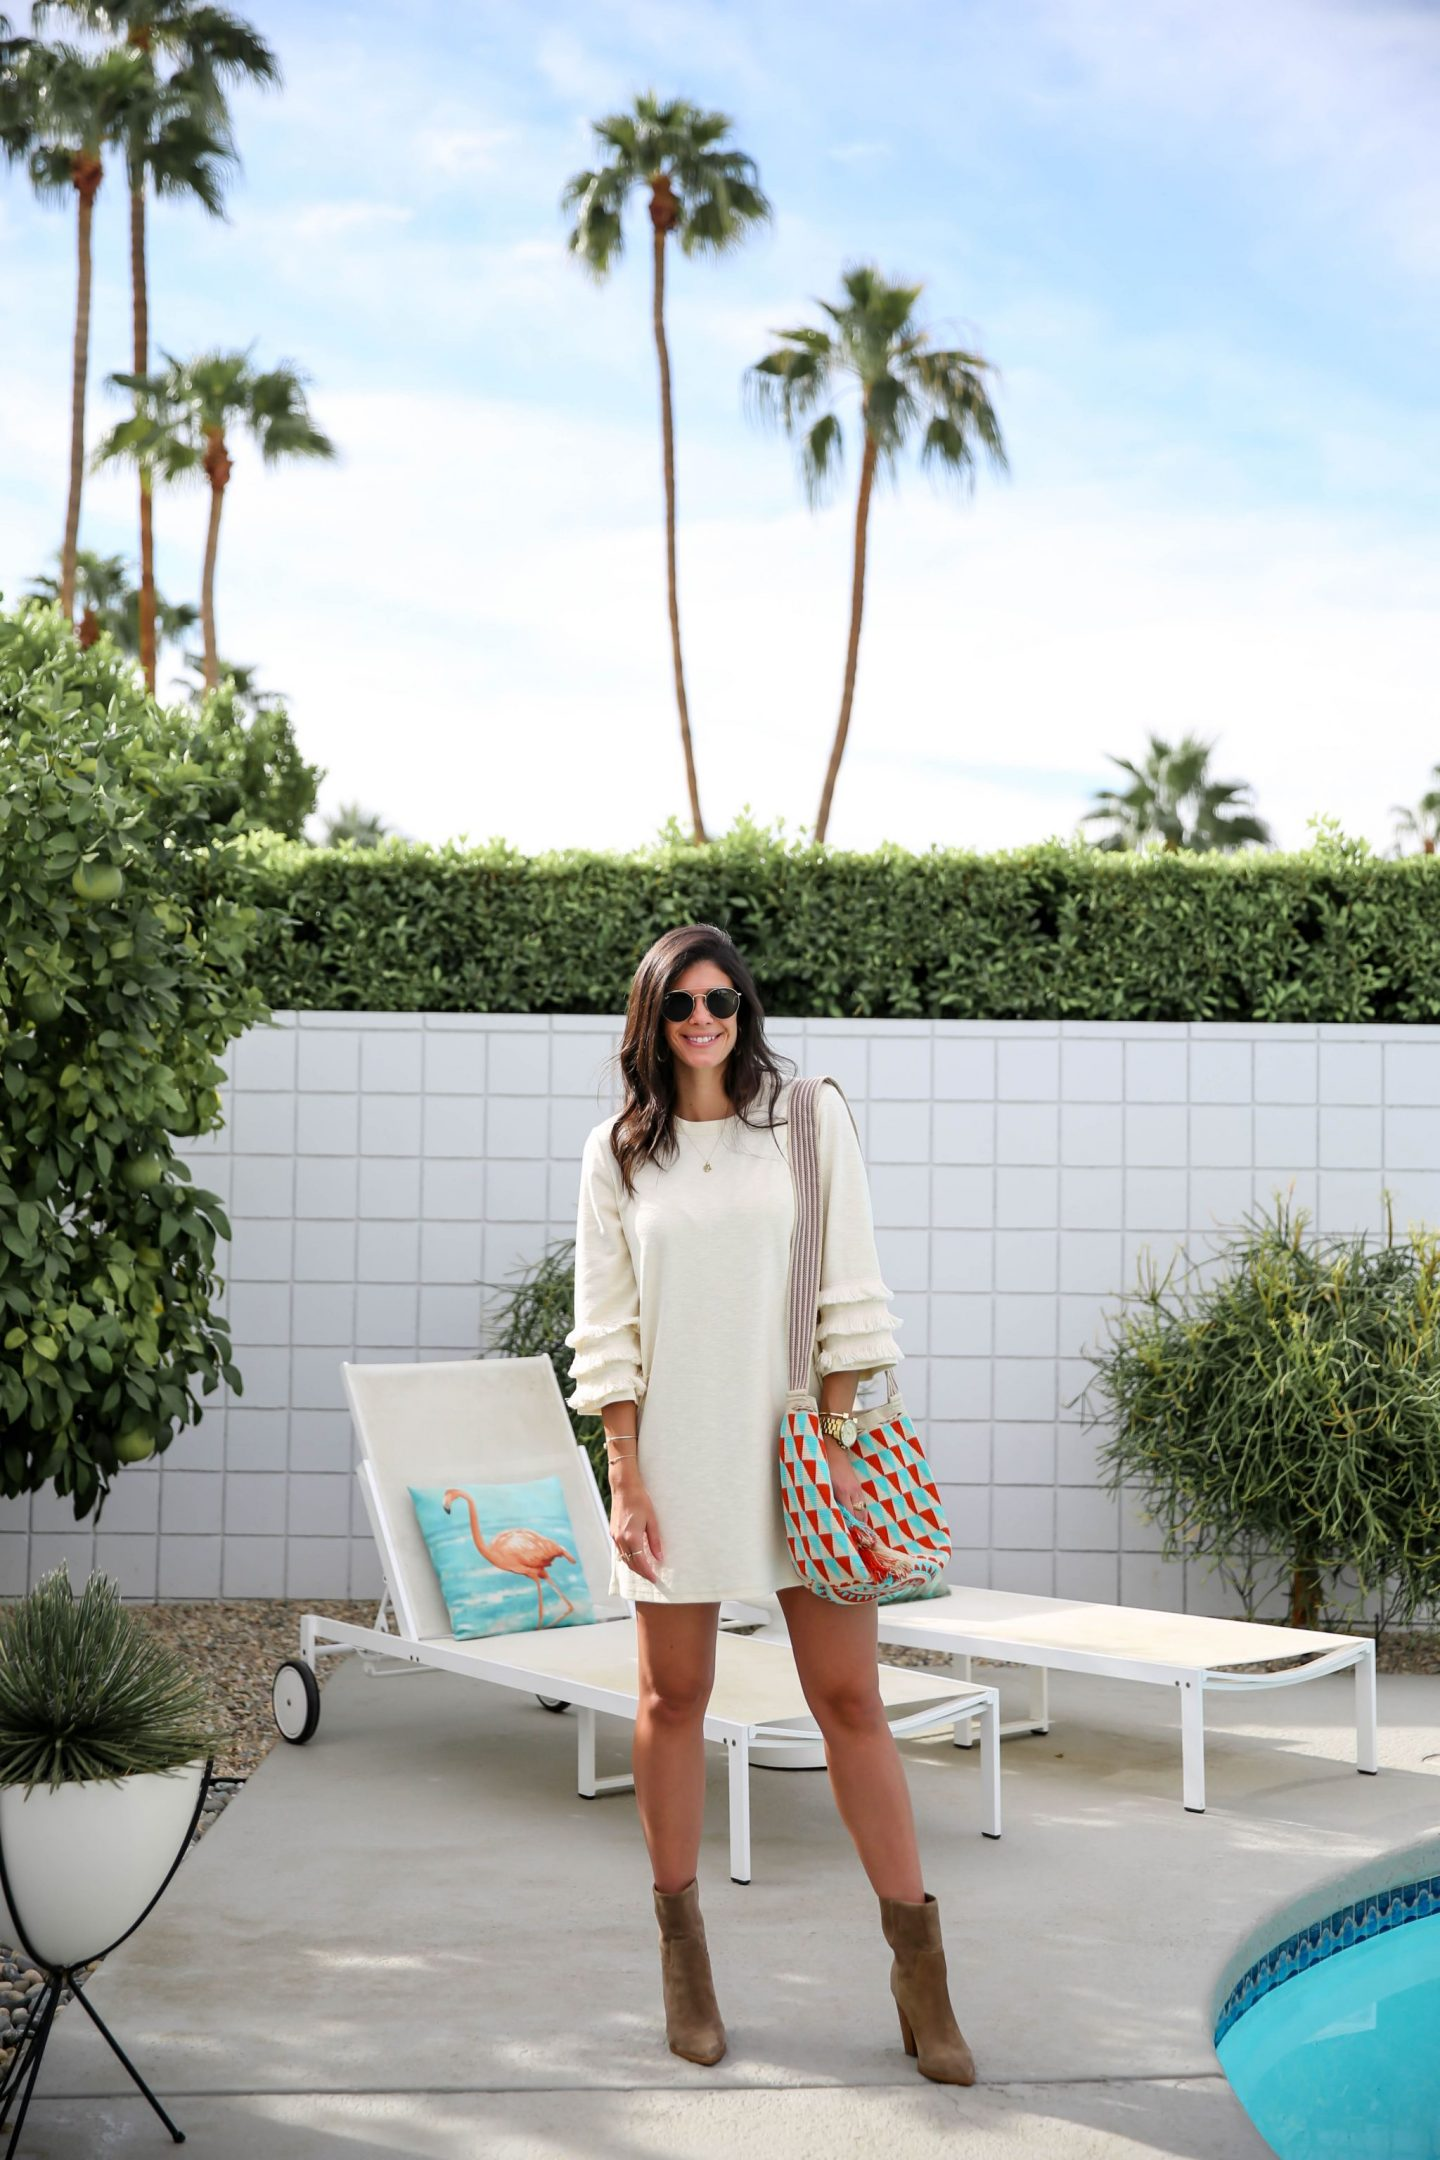 boho chic style - Palm Springs CA - Lauren Schwaiger Style Blog